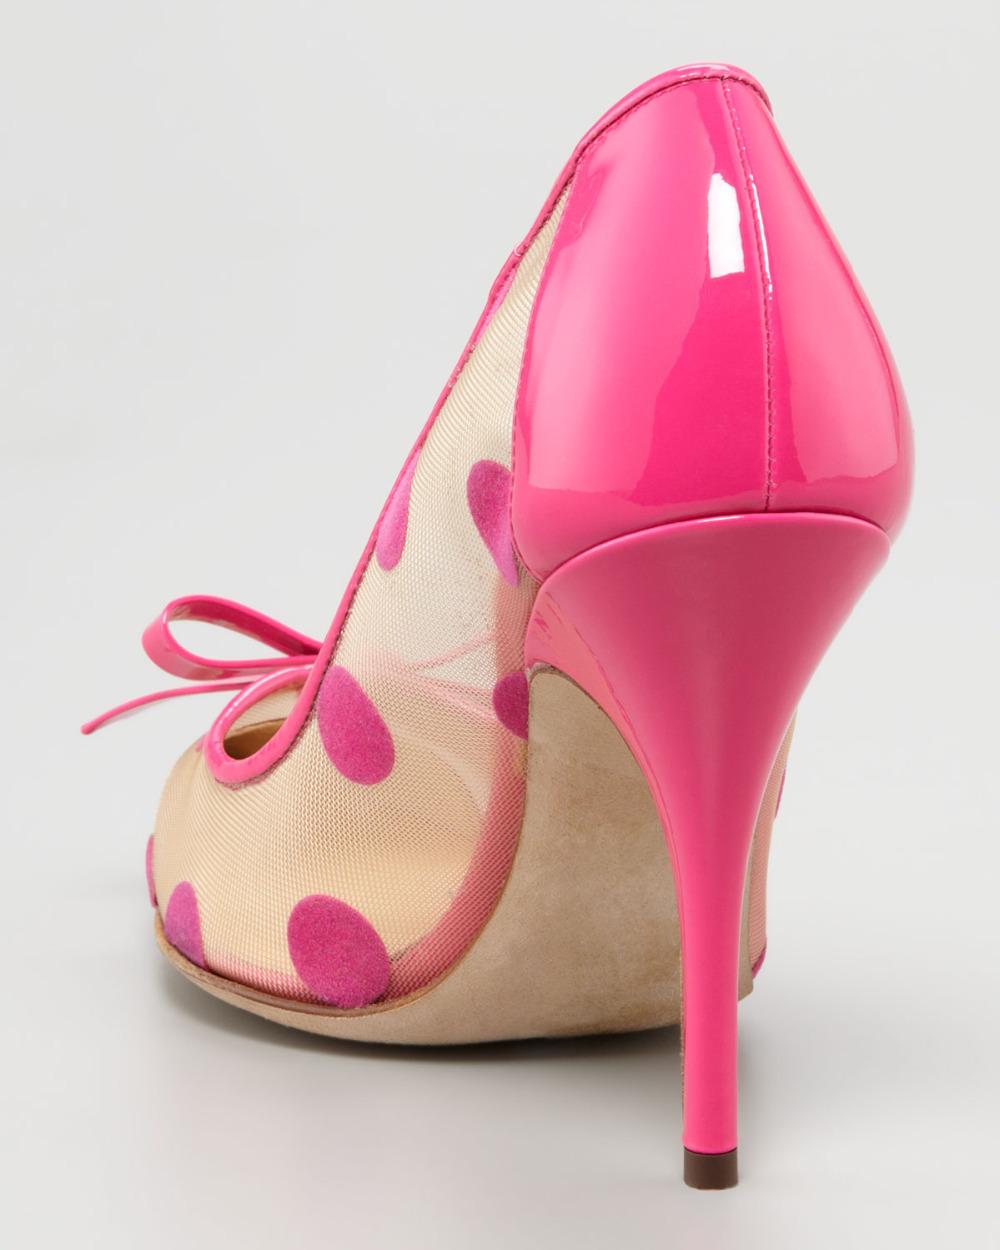 Pink Dress Shoes Women  Cocktail Dresses 2016